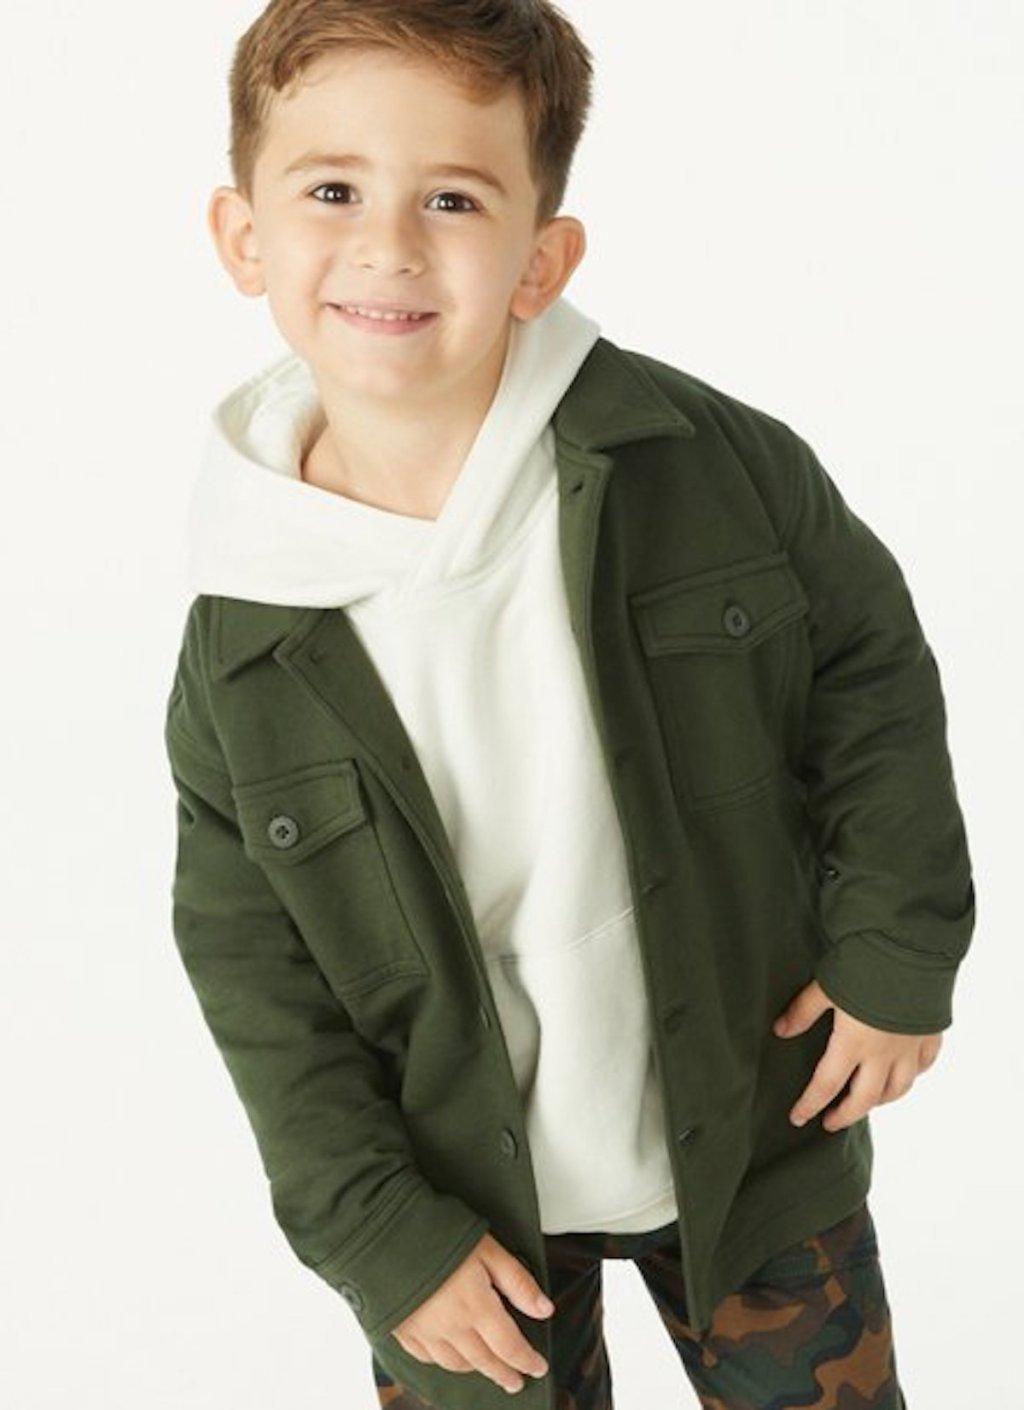 stock photo of boy wearing dark green jacket and white sweatshirt